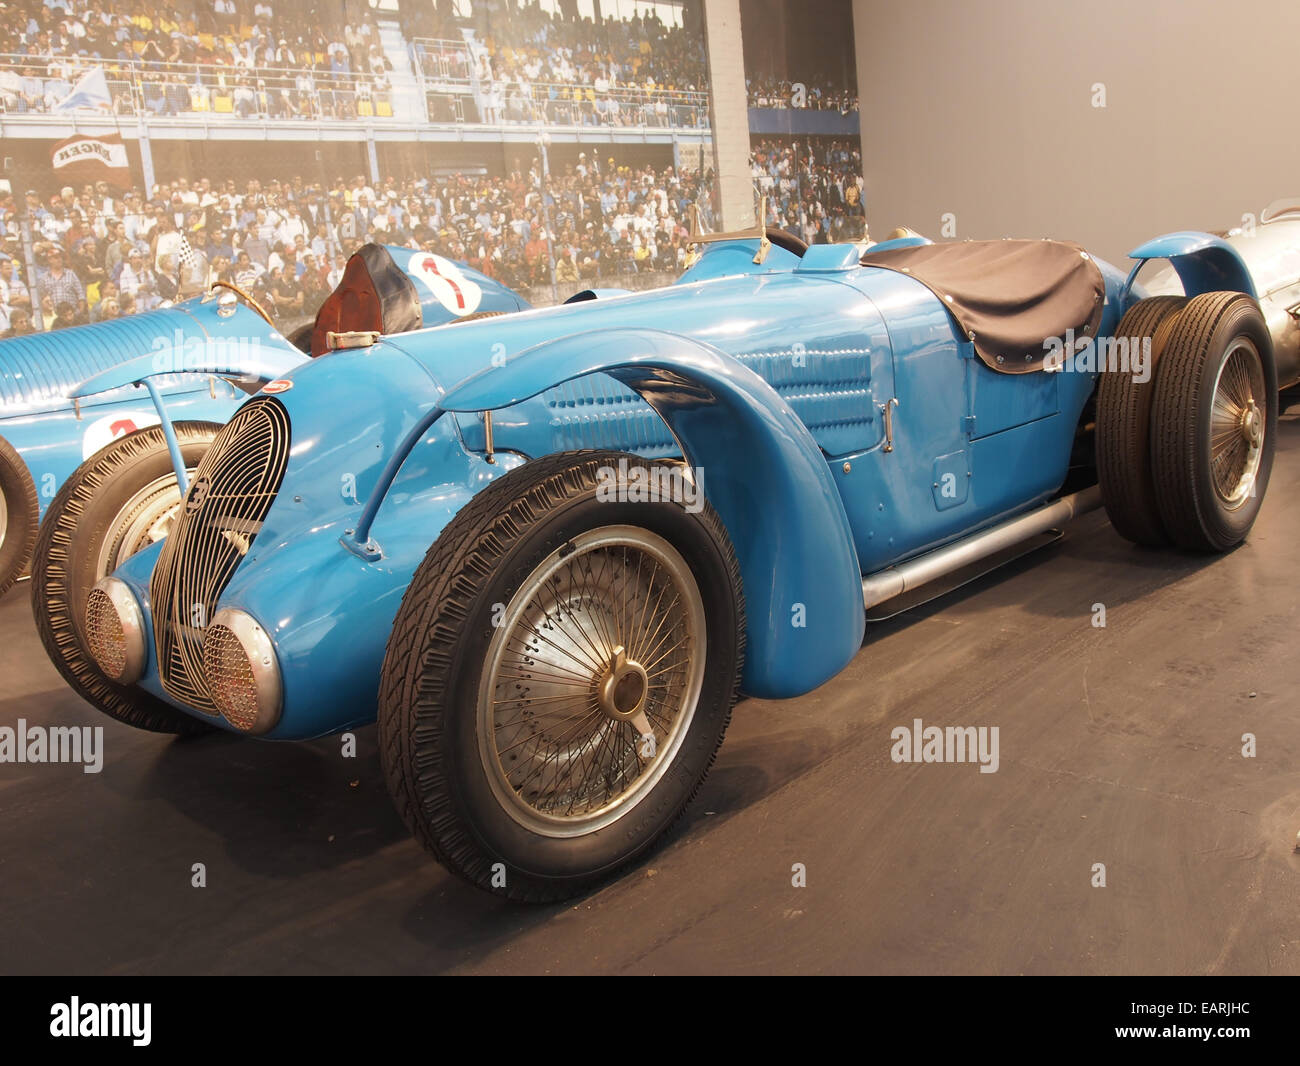 1938 Bugatti GP Type 59-50B, 8 cylinders, 4741cm3, 400hp, 300kmh, photo 2 - Stock Image